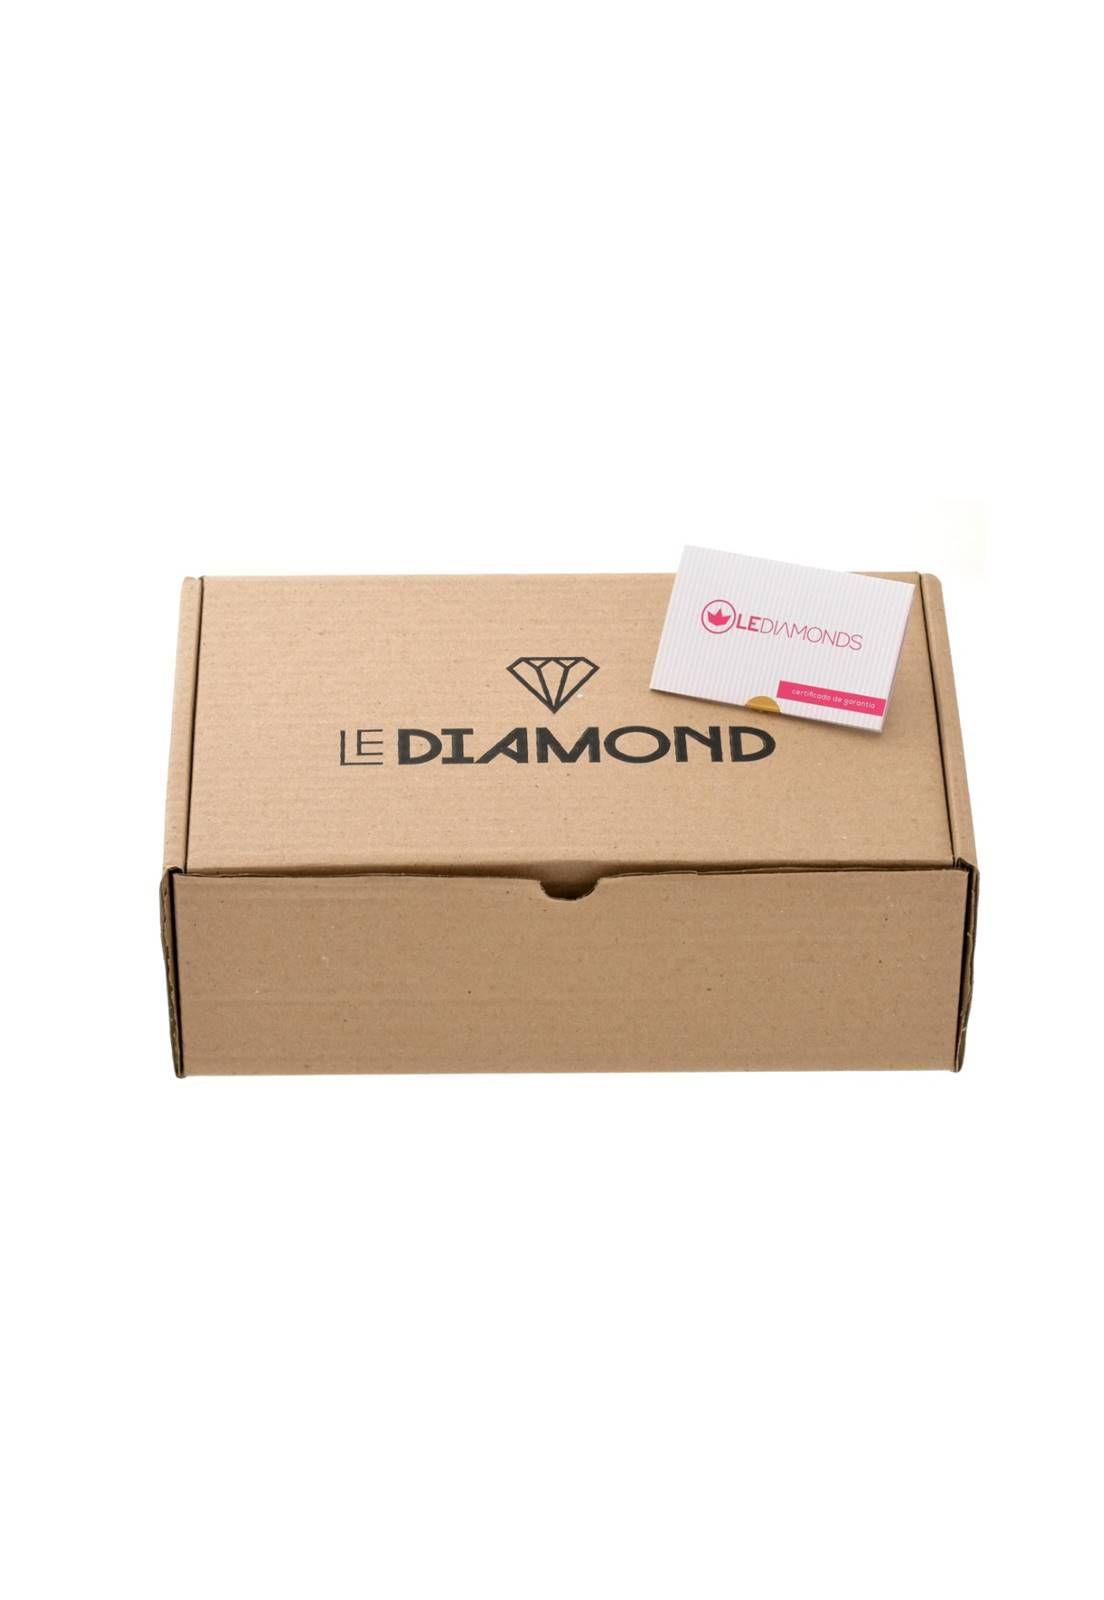 Brinco Argola Frontal Le Diamond Paetê